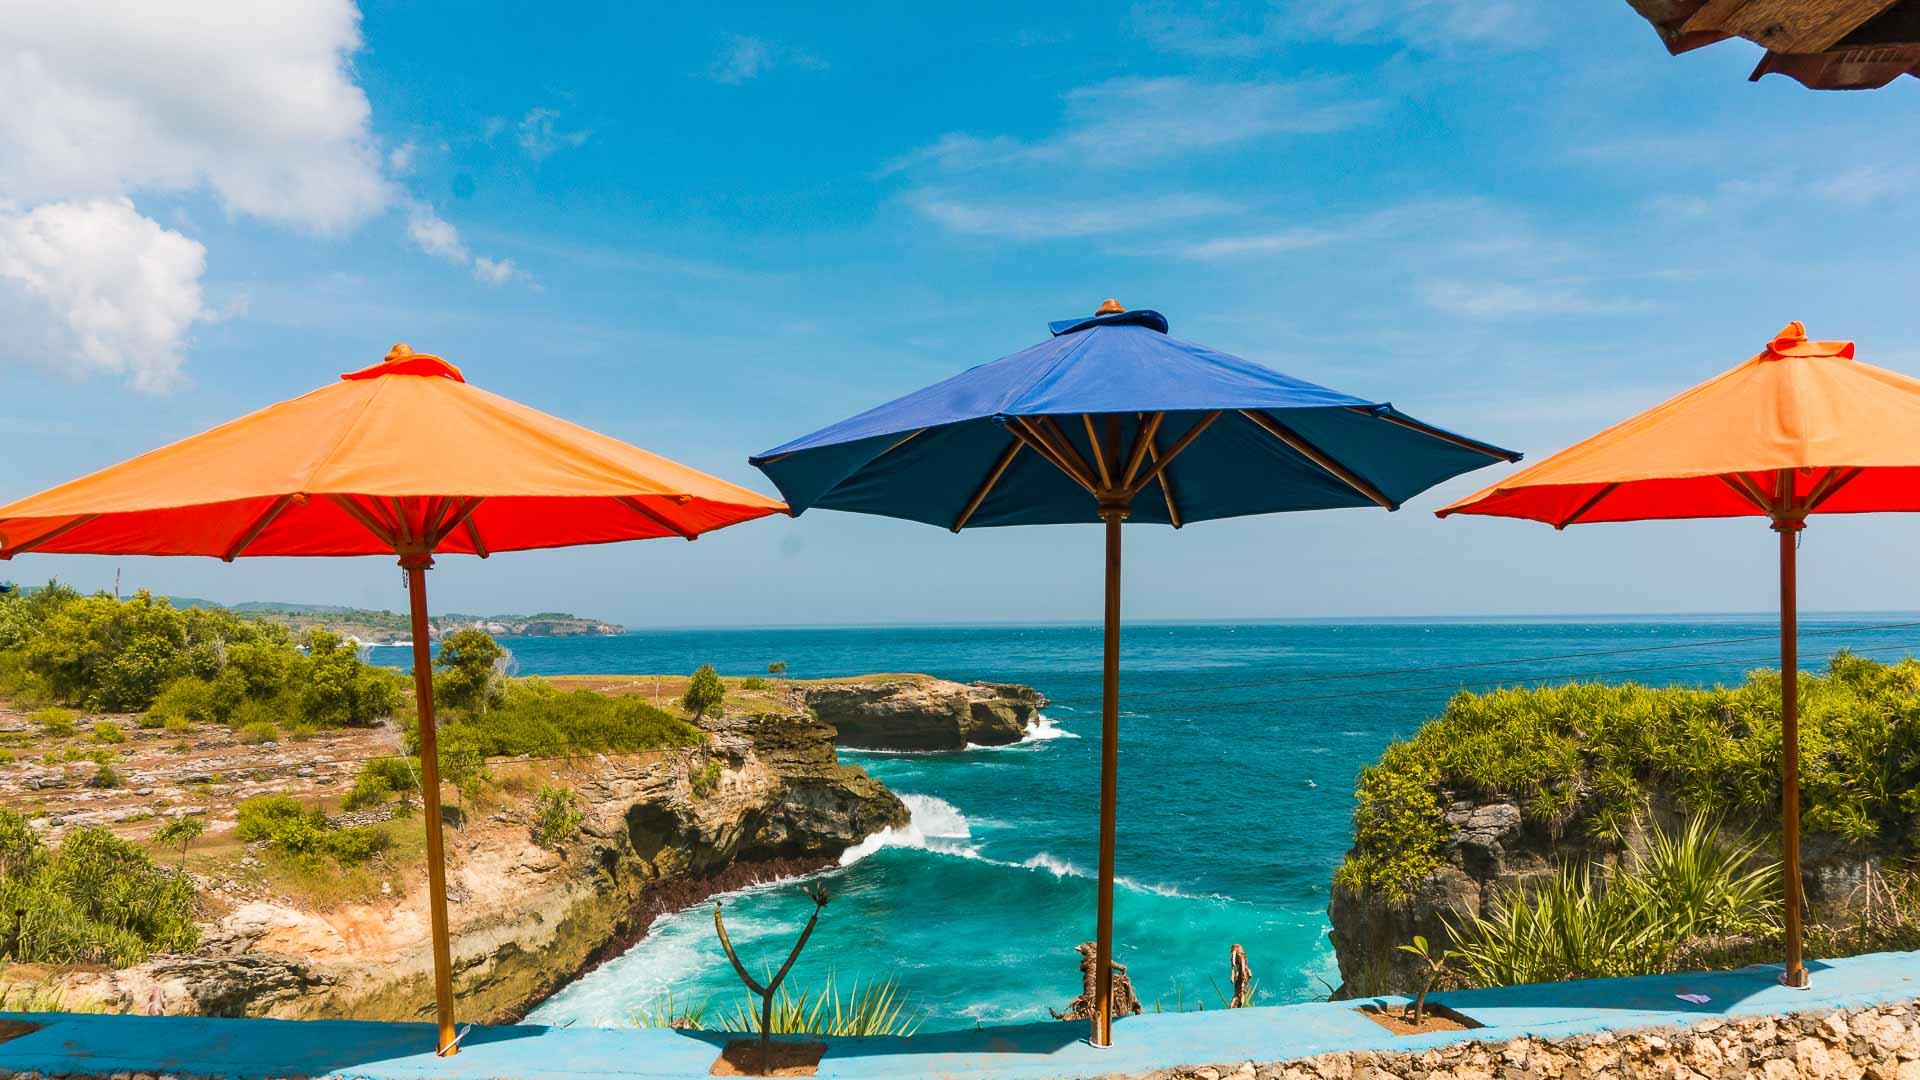 Nusa Lembongan And Nusa Ceningan View From An Infinity Pool